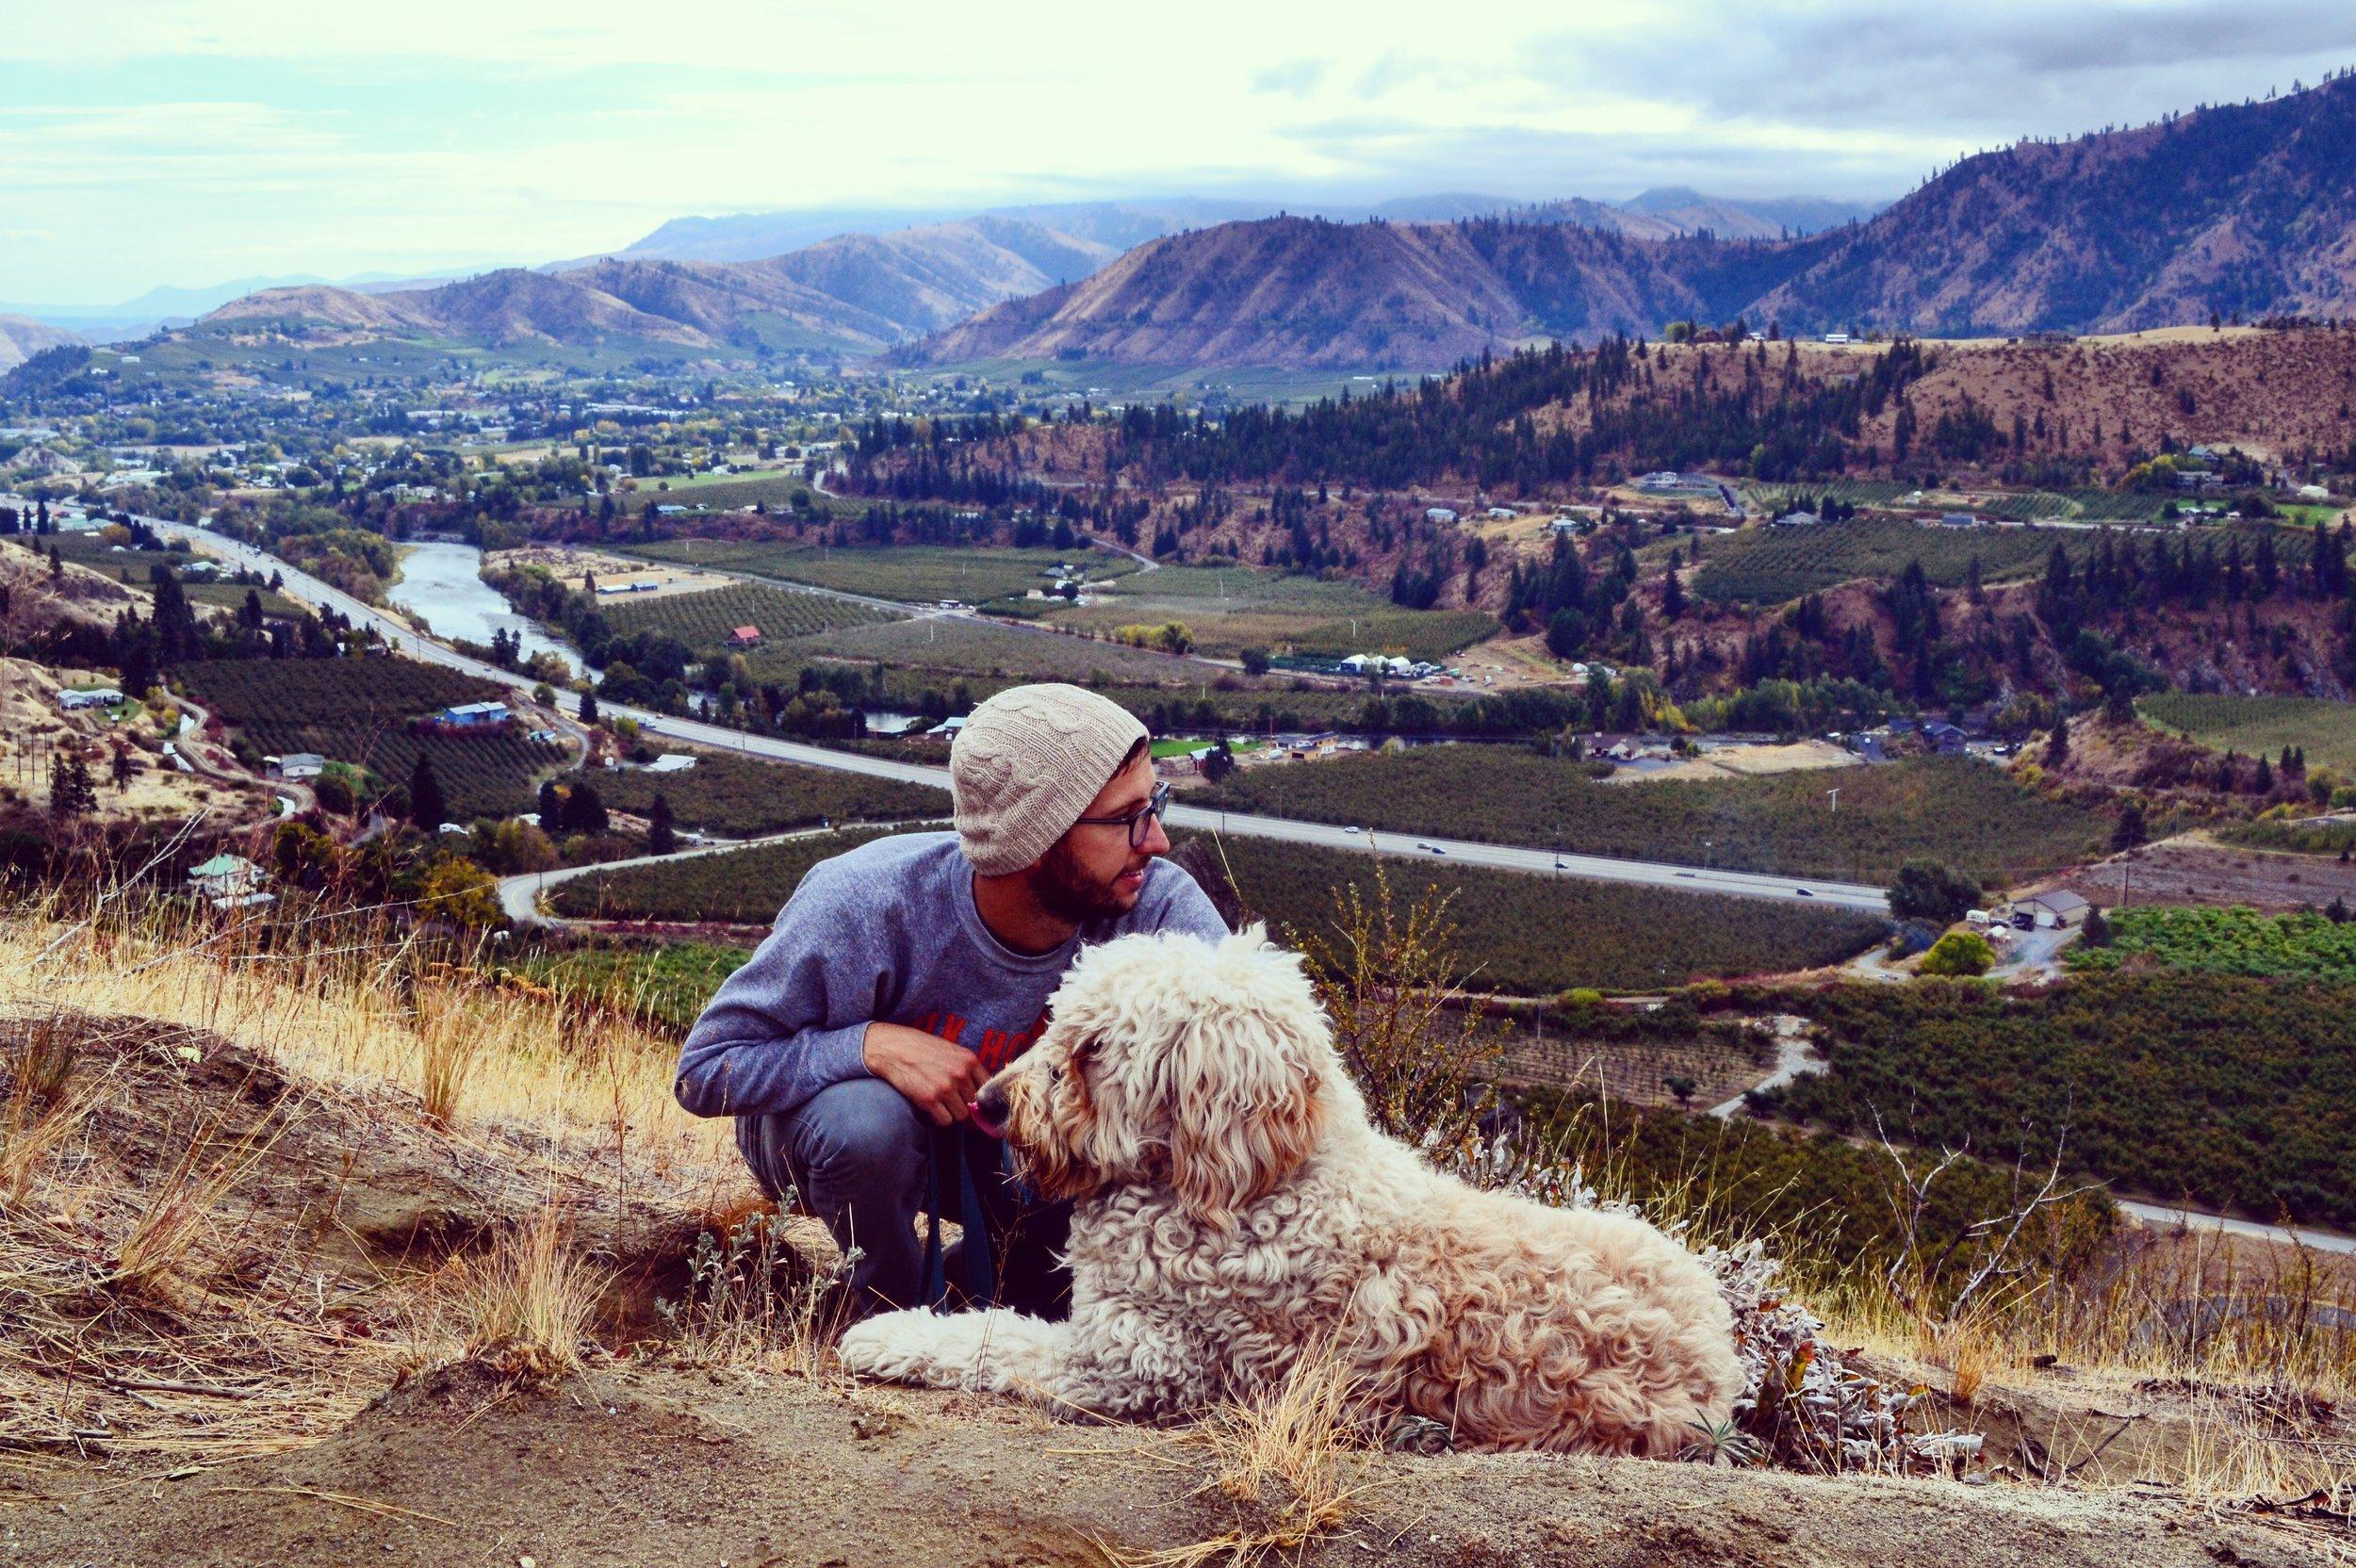 Costello hiked Peshastin Pinnacles in the Columbia River Valley, Washington.